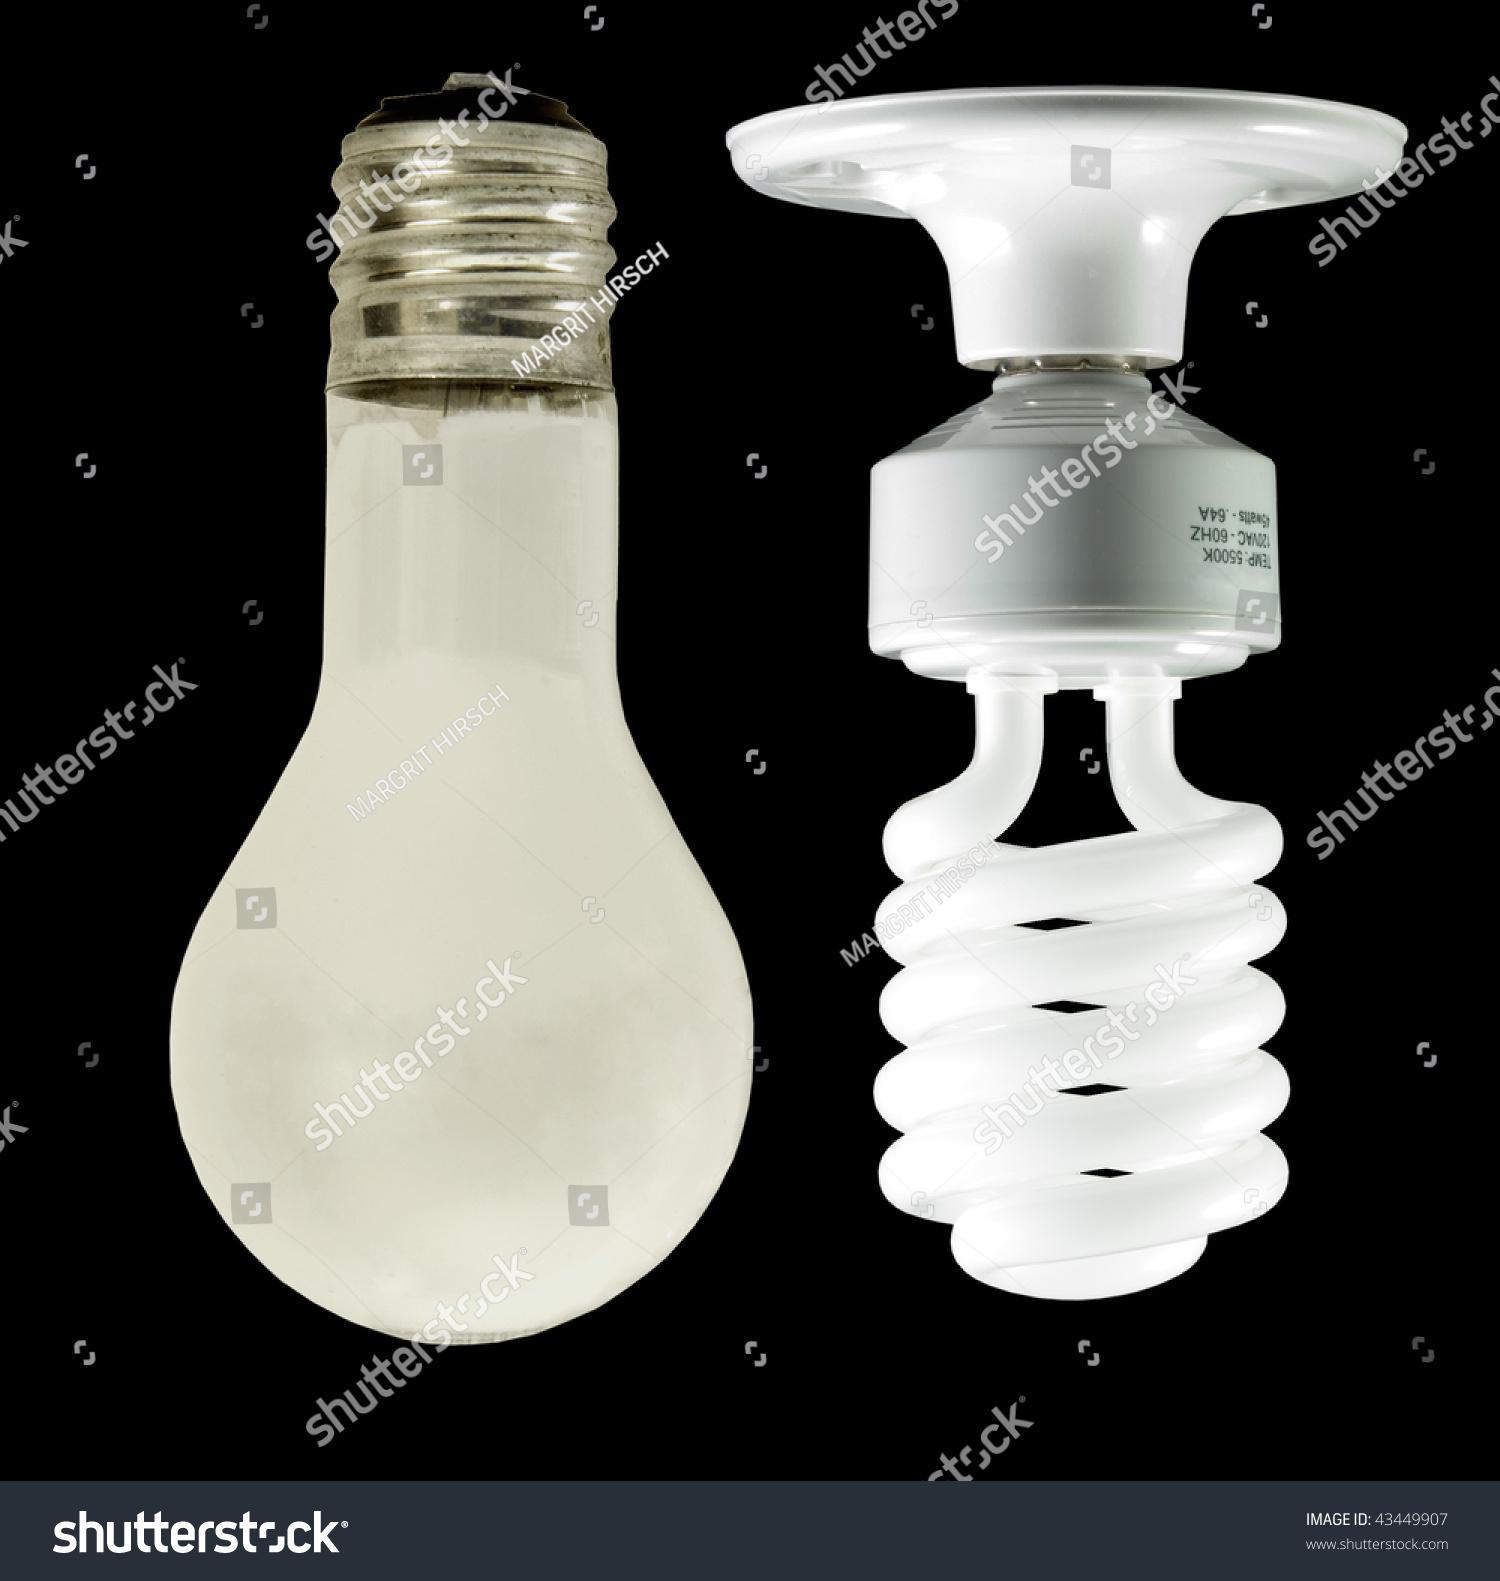 Old New Ecofriendly Lightbulbs Stock Photo 43449907 Shutterstock